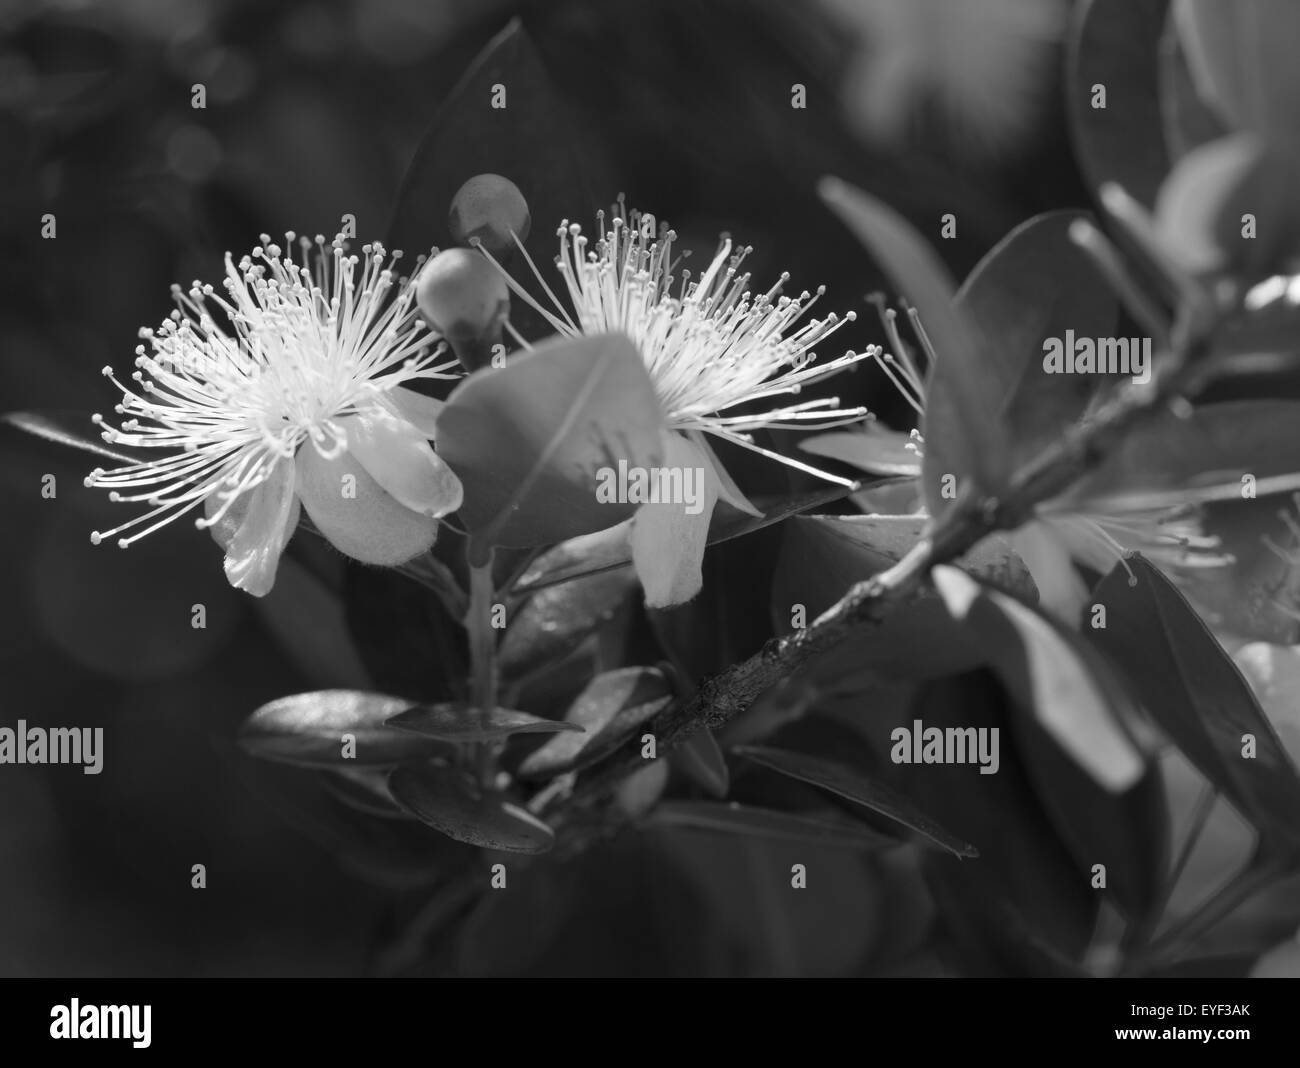 Branch with flower and pistil in Royal Botanic Garden of Madrid, Spain, Europe - Stock Image